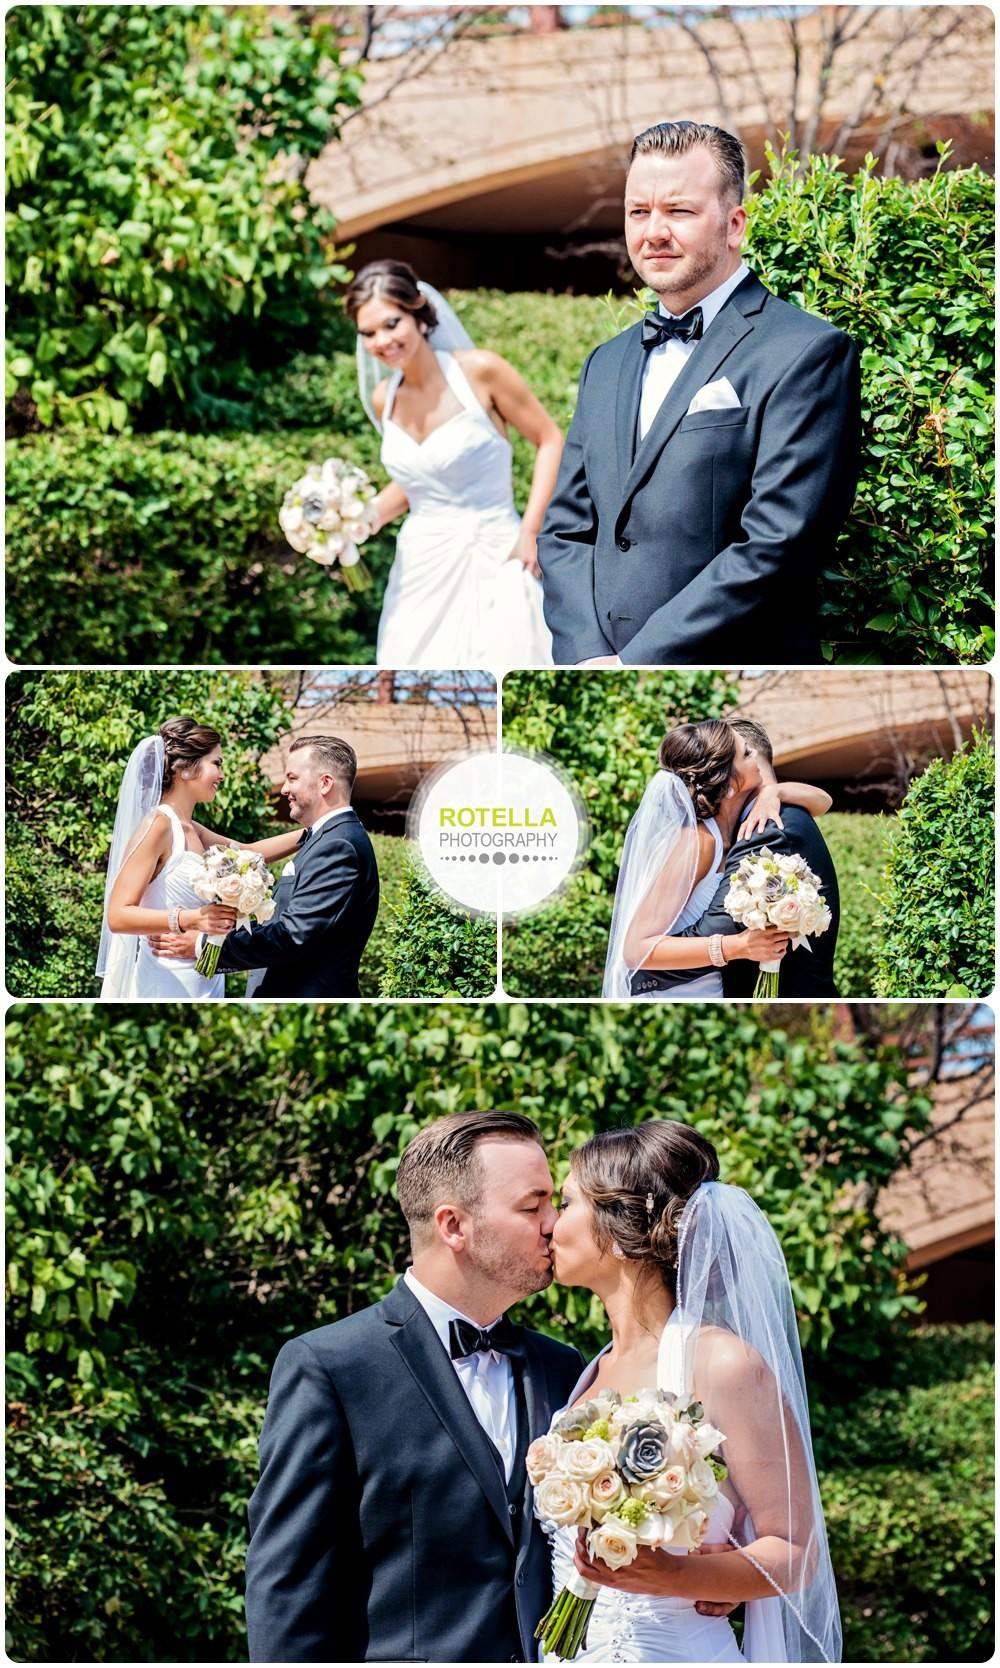 MELANIE-DEREK-MINNESOTA-WEDDING-PHOTOGRAPHY-ROTELLA-PHOTOGRAPHY_2015-04